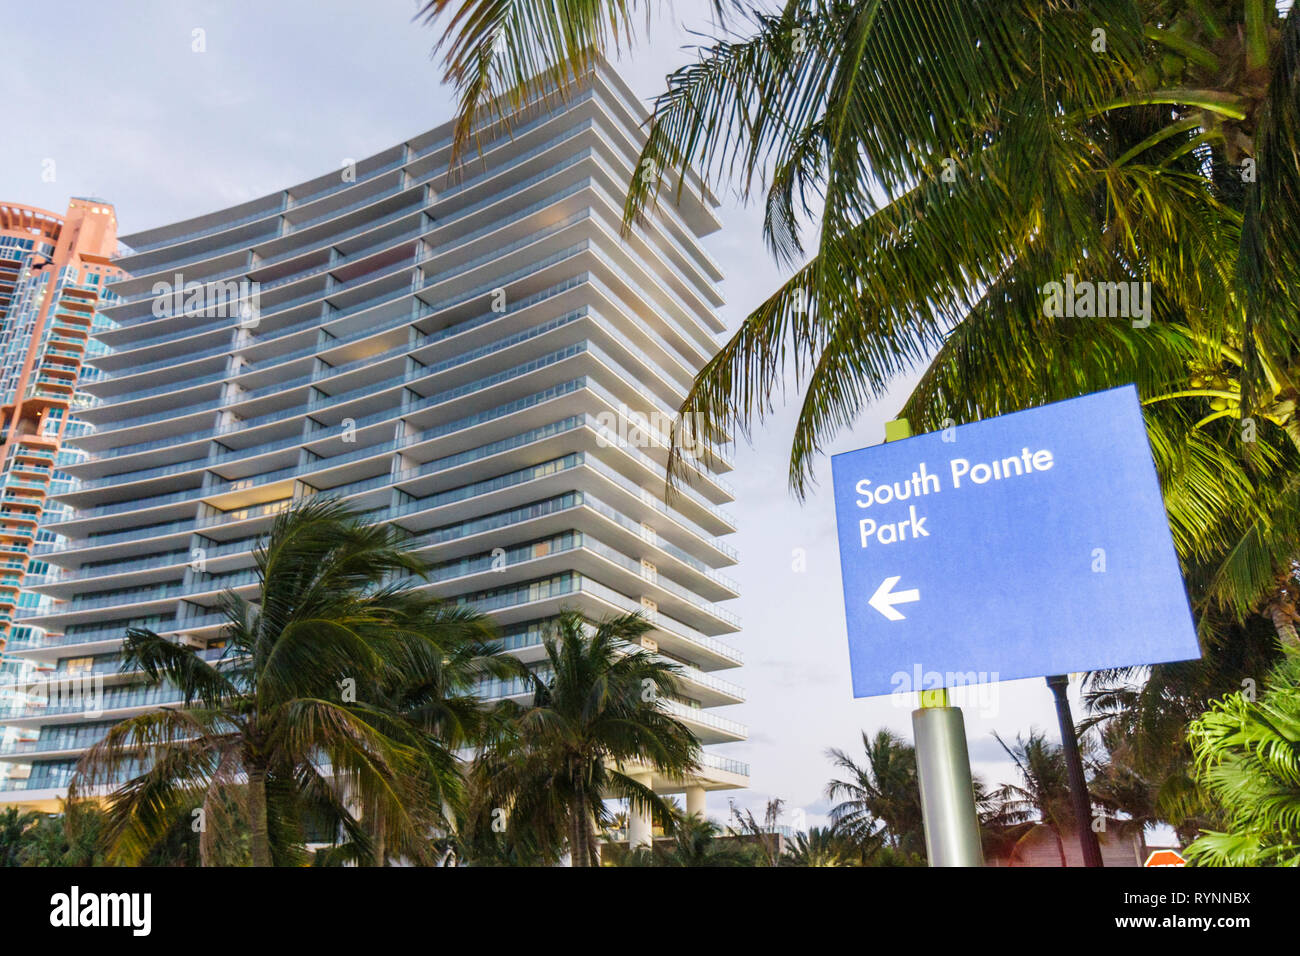 Miami Beach Florida South Beach South Pointe Apogee luxury condominium real estate residence apartment building Sieger Suarez ar - Stock Image